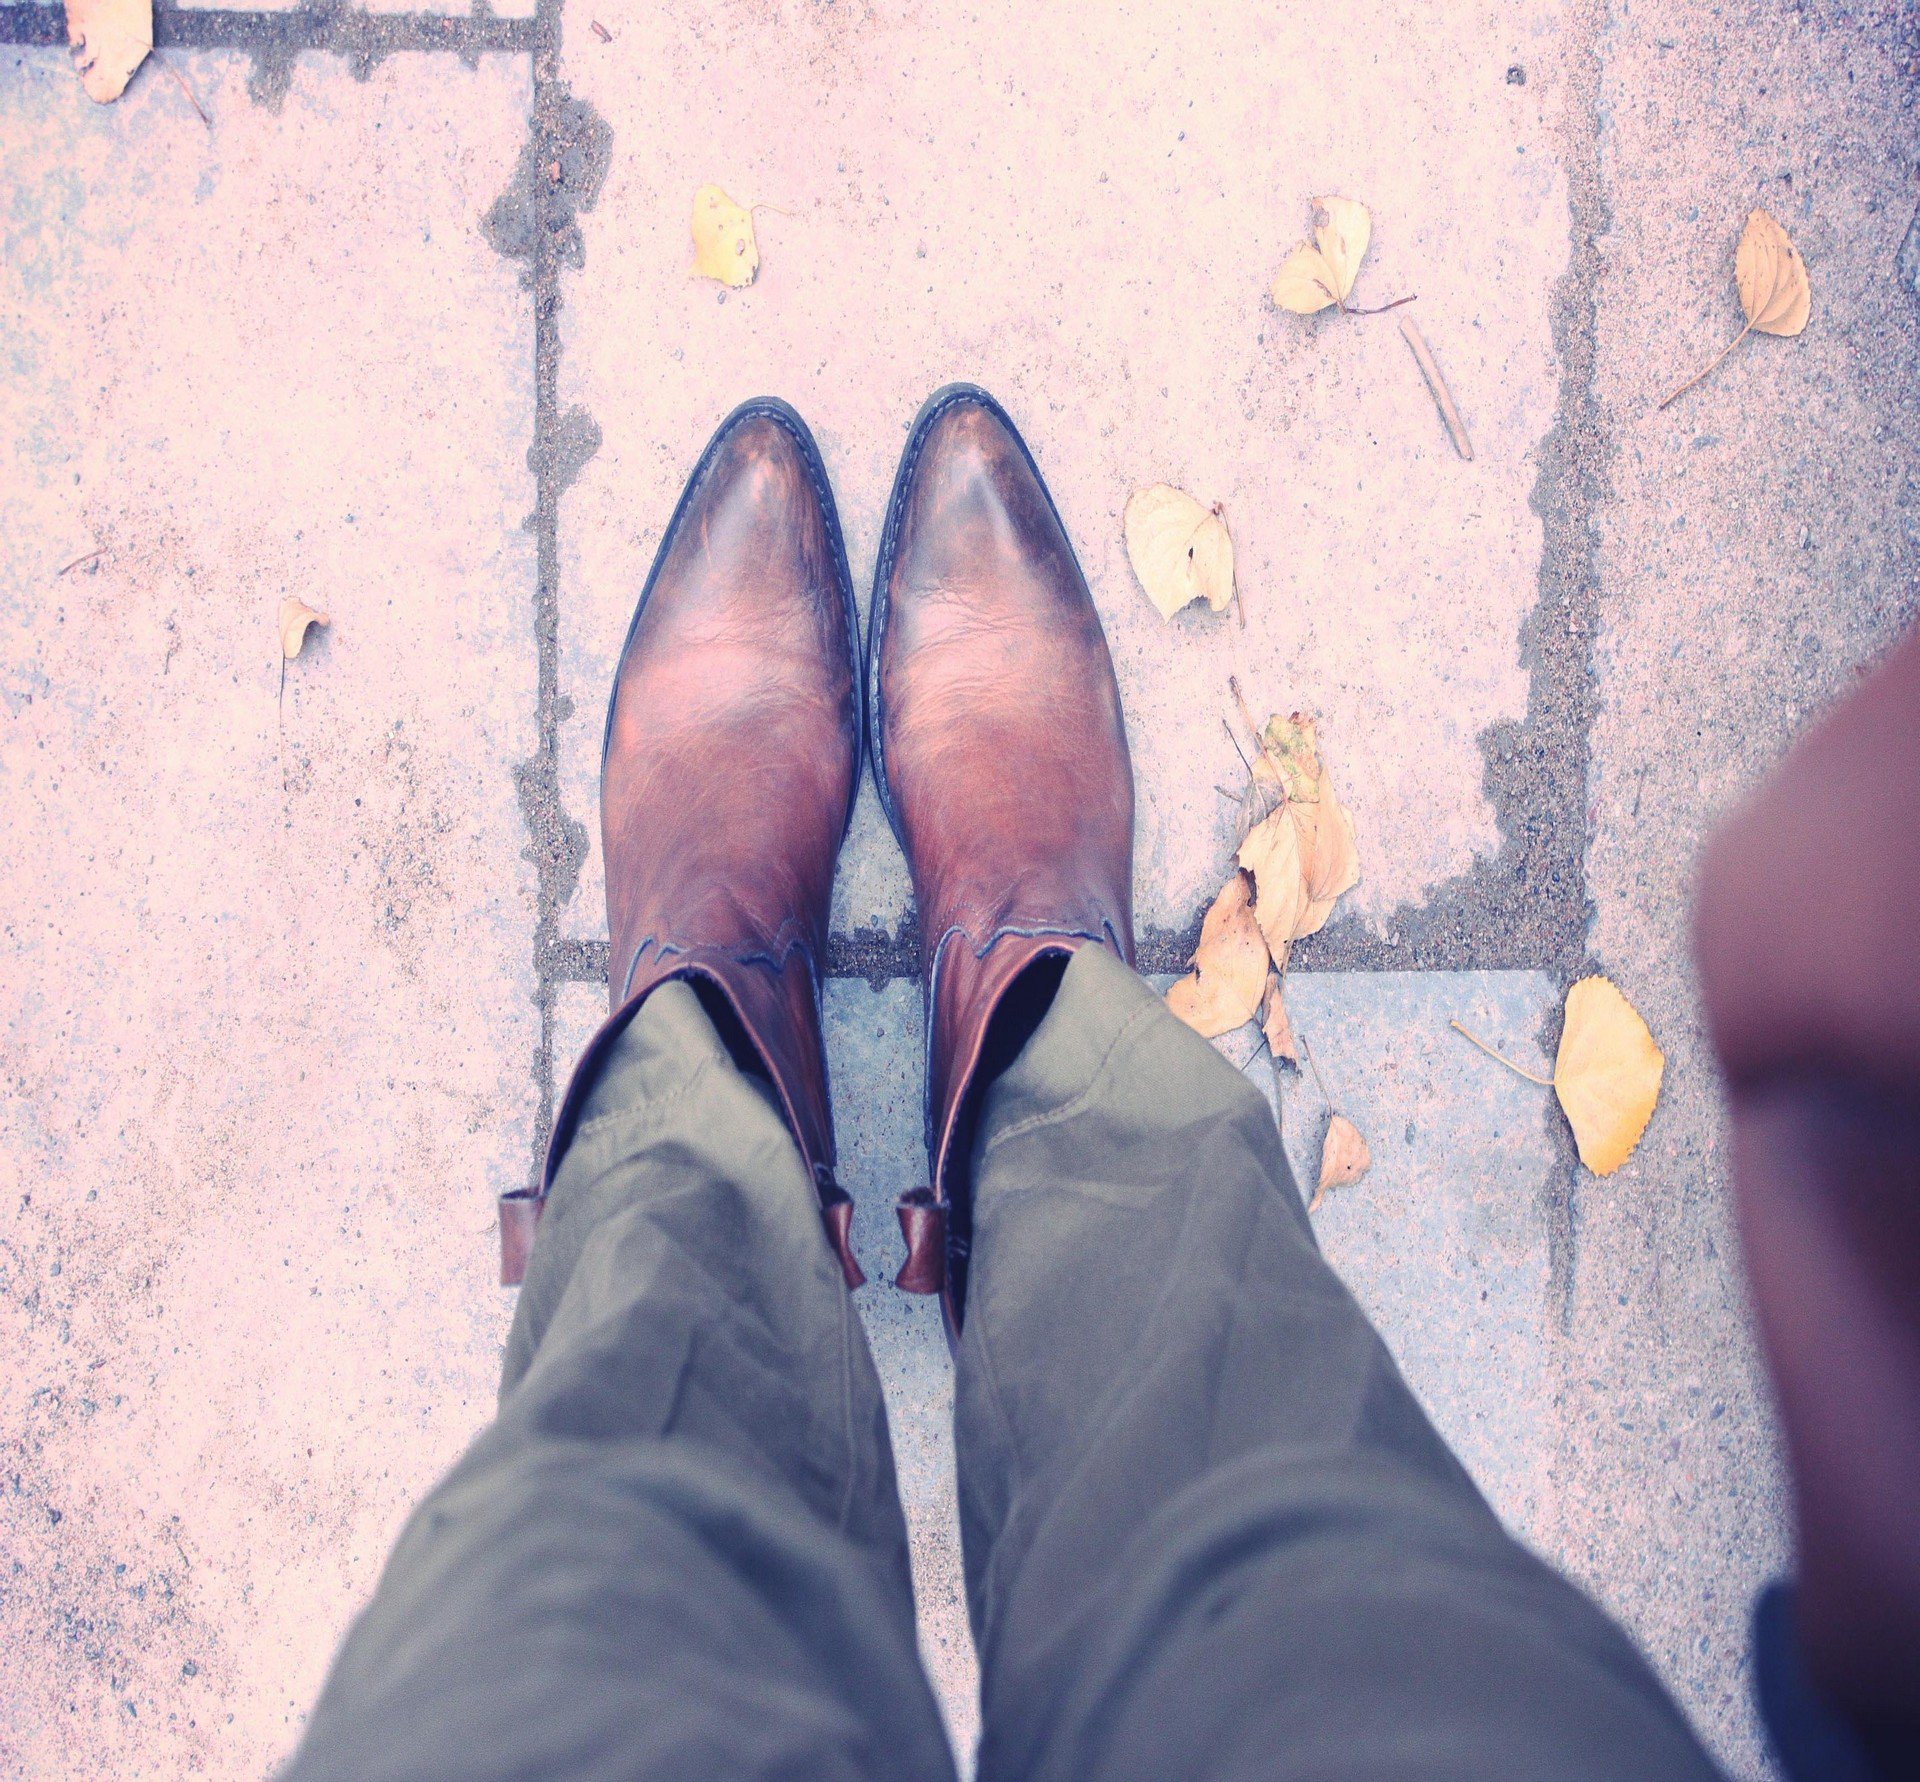 nunaavane-fashion-blogger-stockholm-europe-trip-outfit-casual-wear-ctbb5